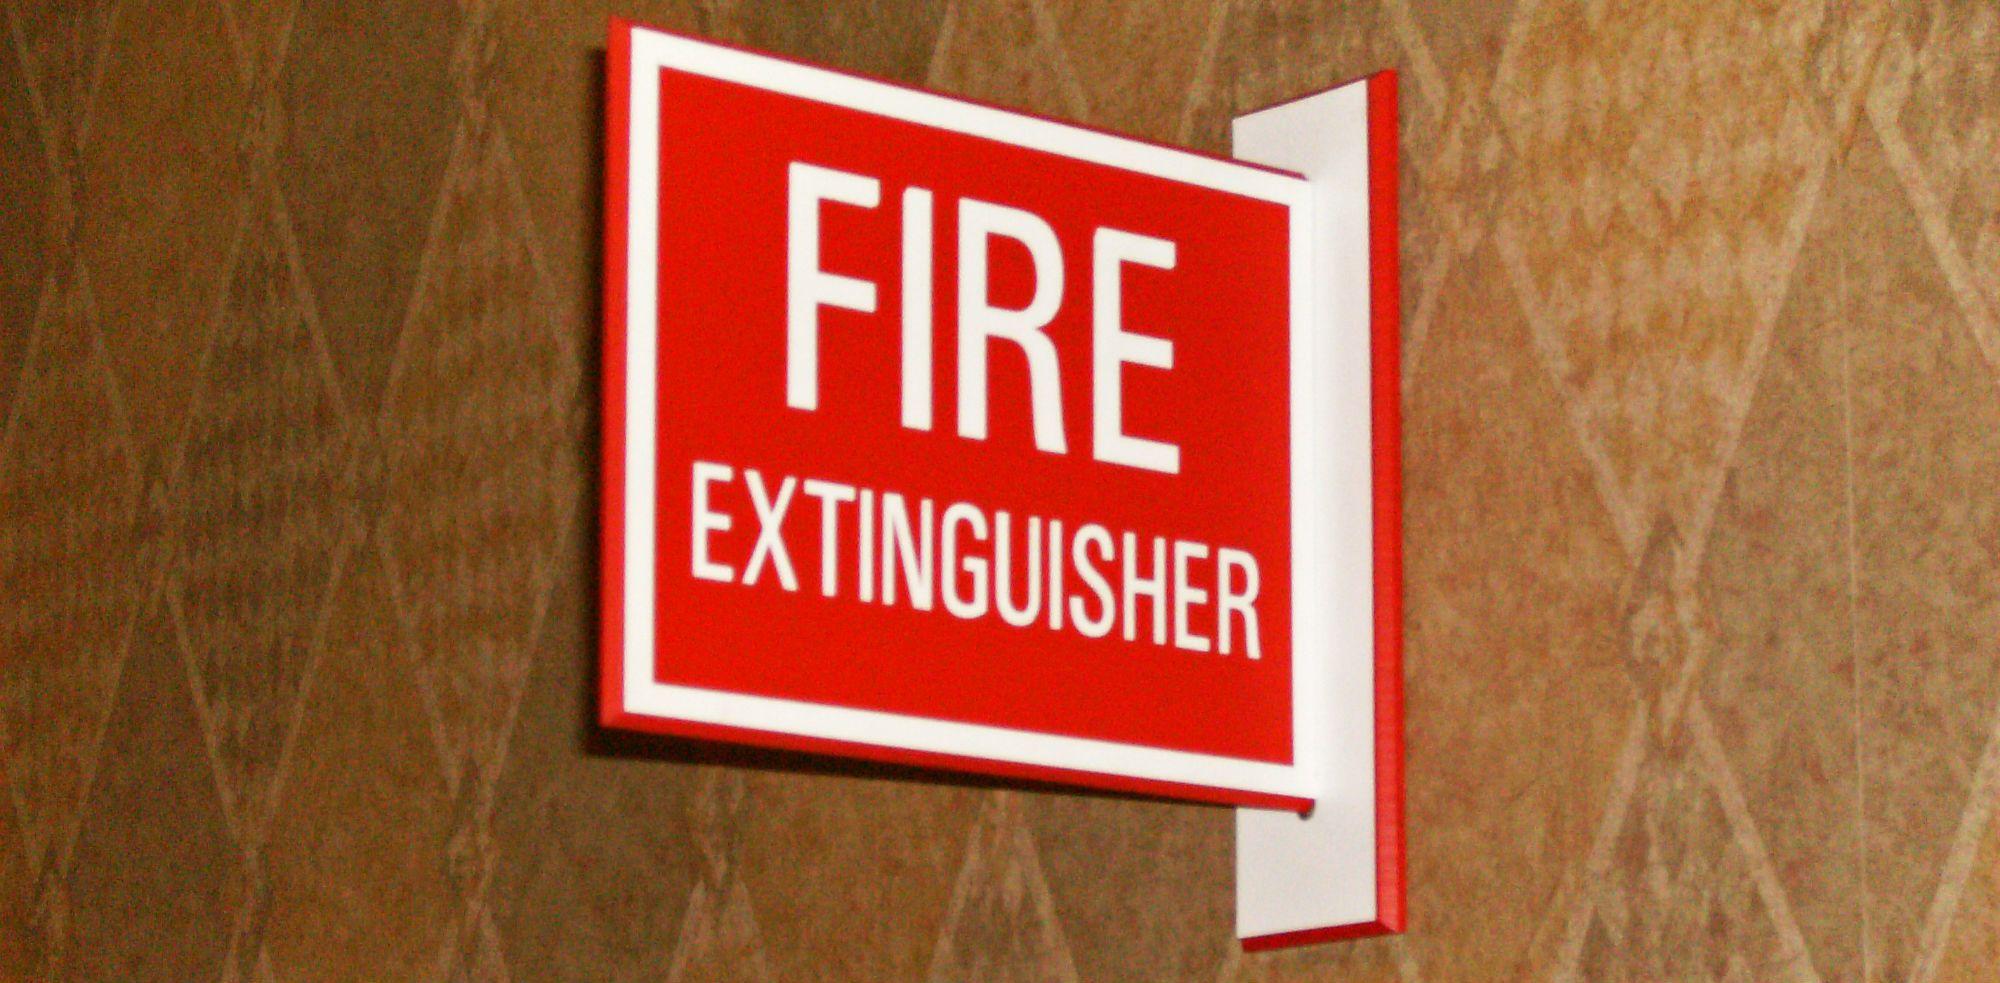 hazard warning safety signage signs now